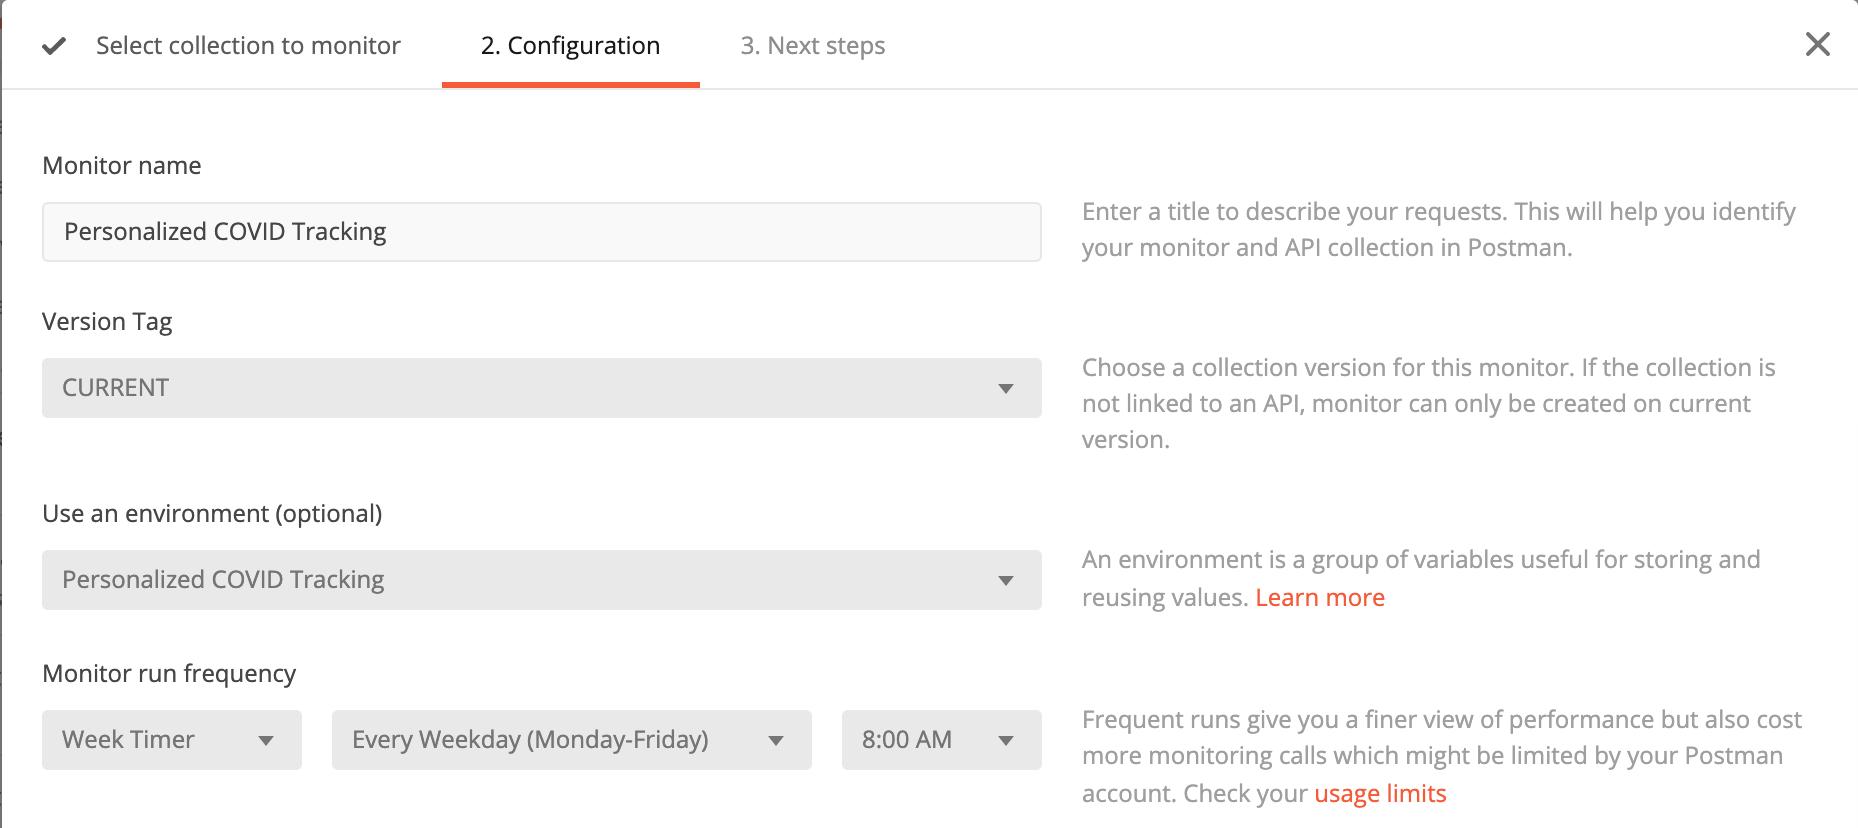 Monitoring configuration pane